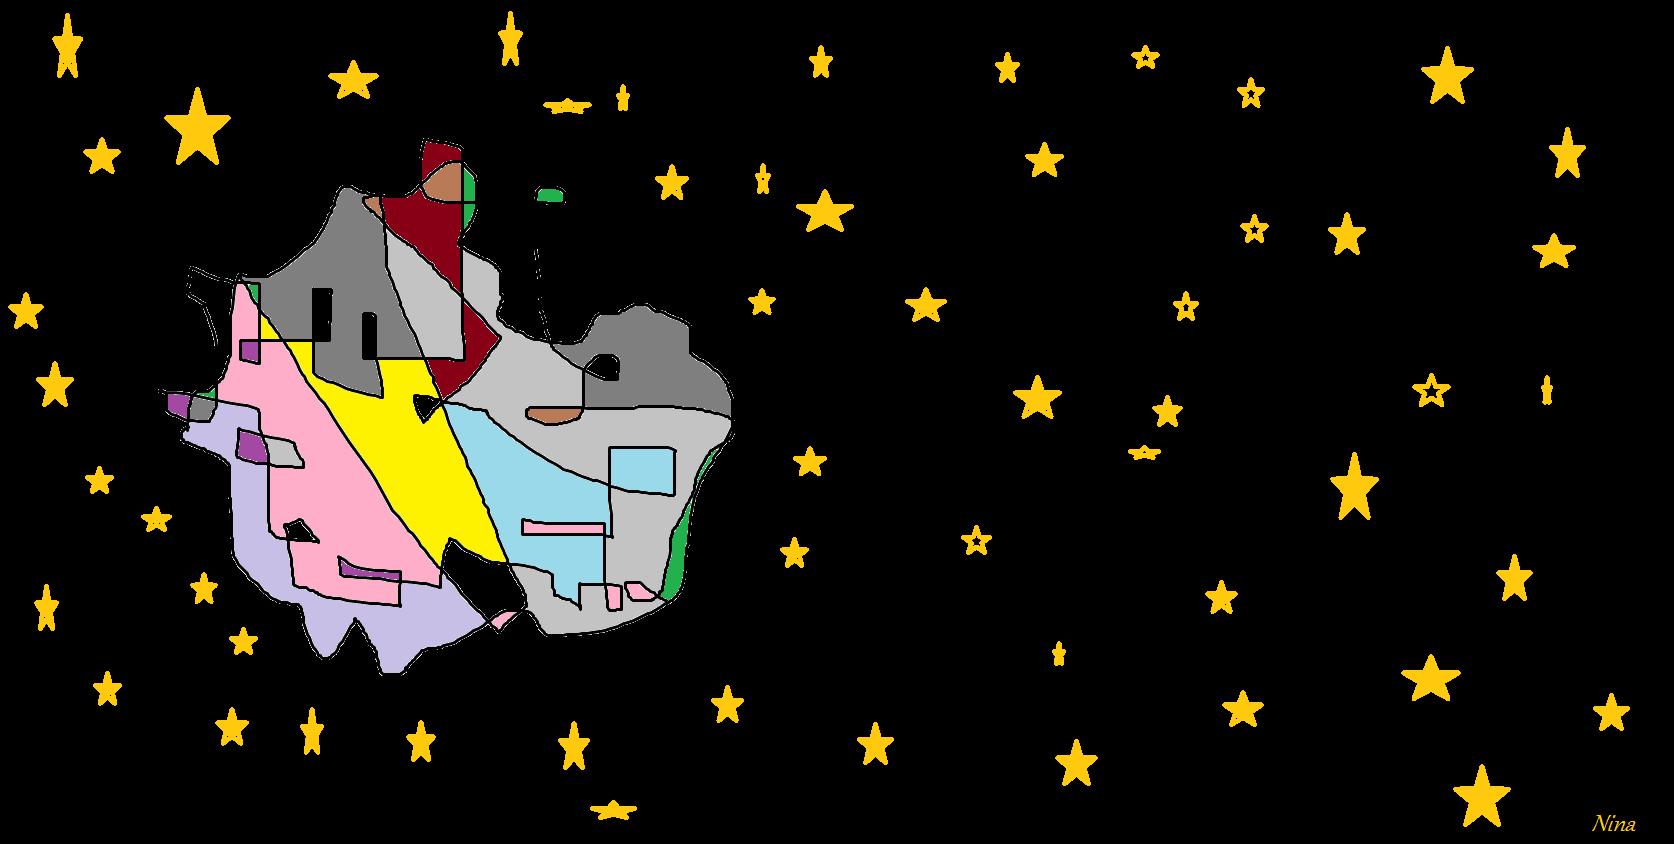 Landet i rymden